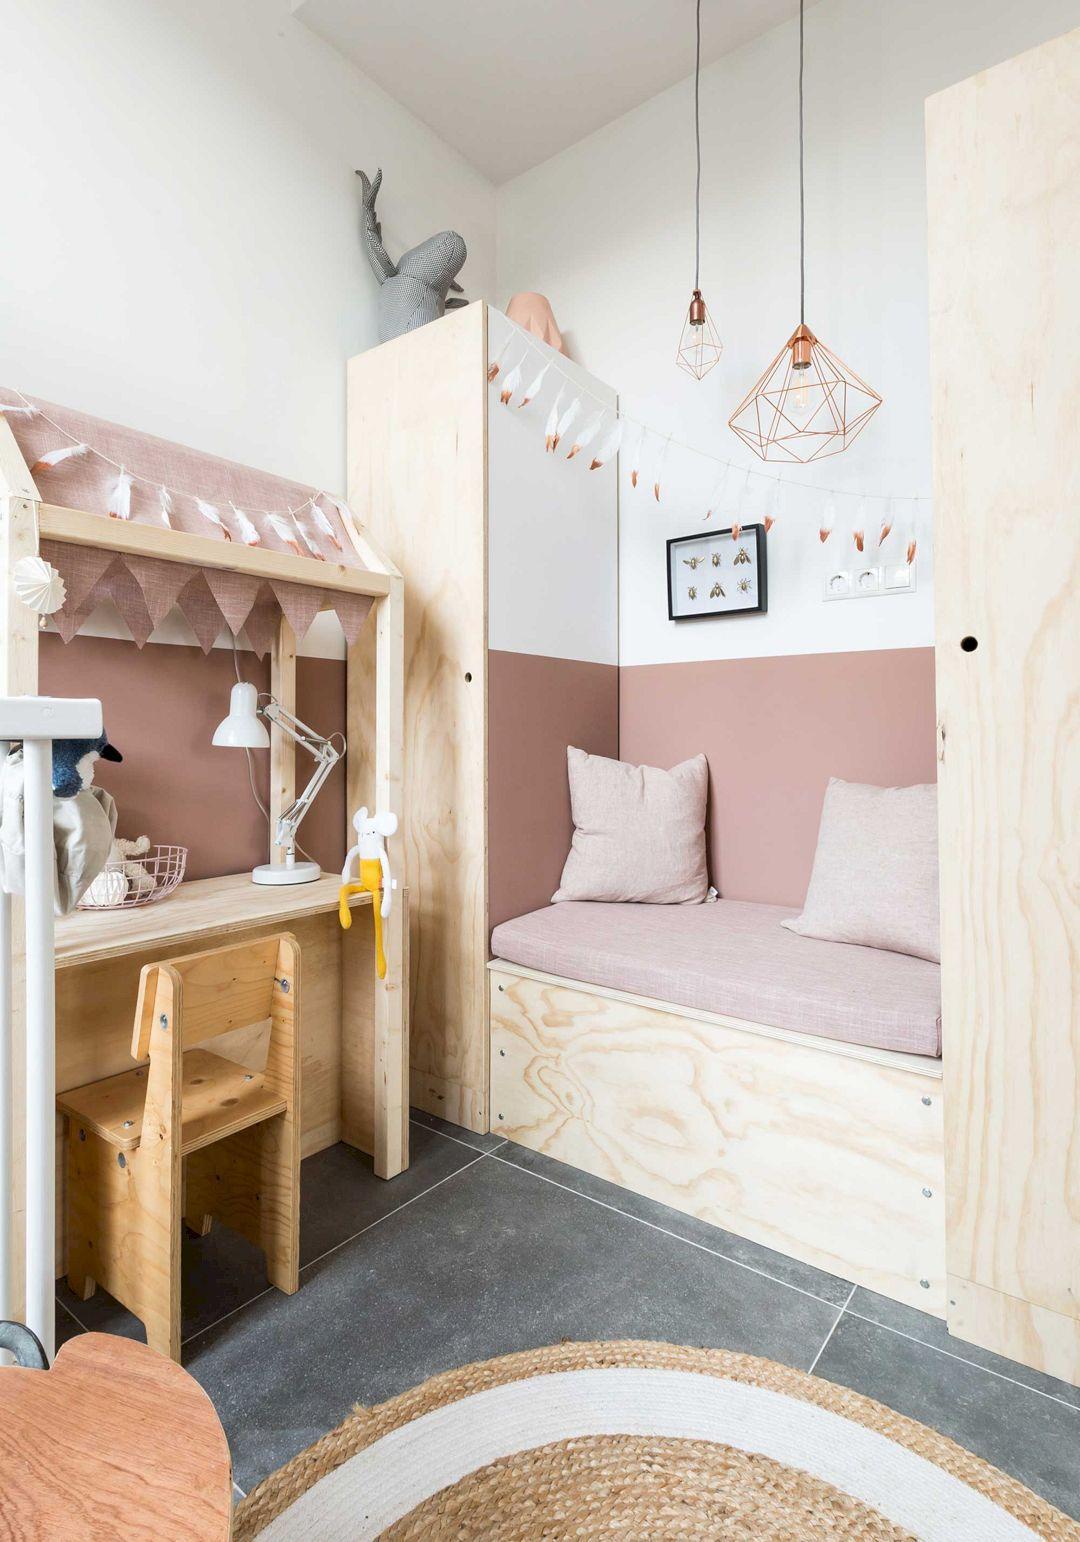 100 Beautiful Kids Bedroom Decoration Ideas  Https://www.futuristarchitecture.com/